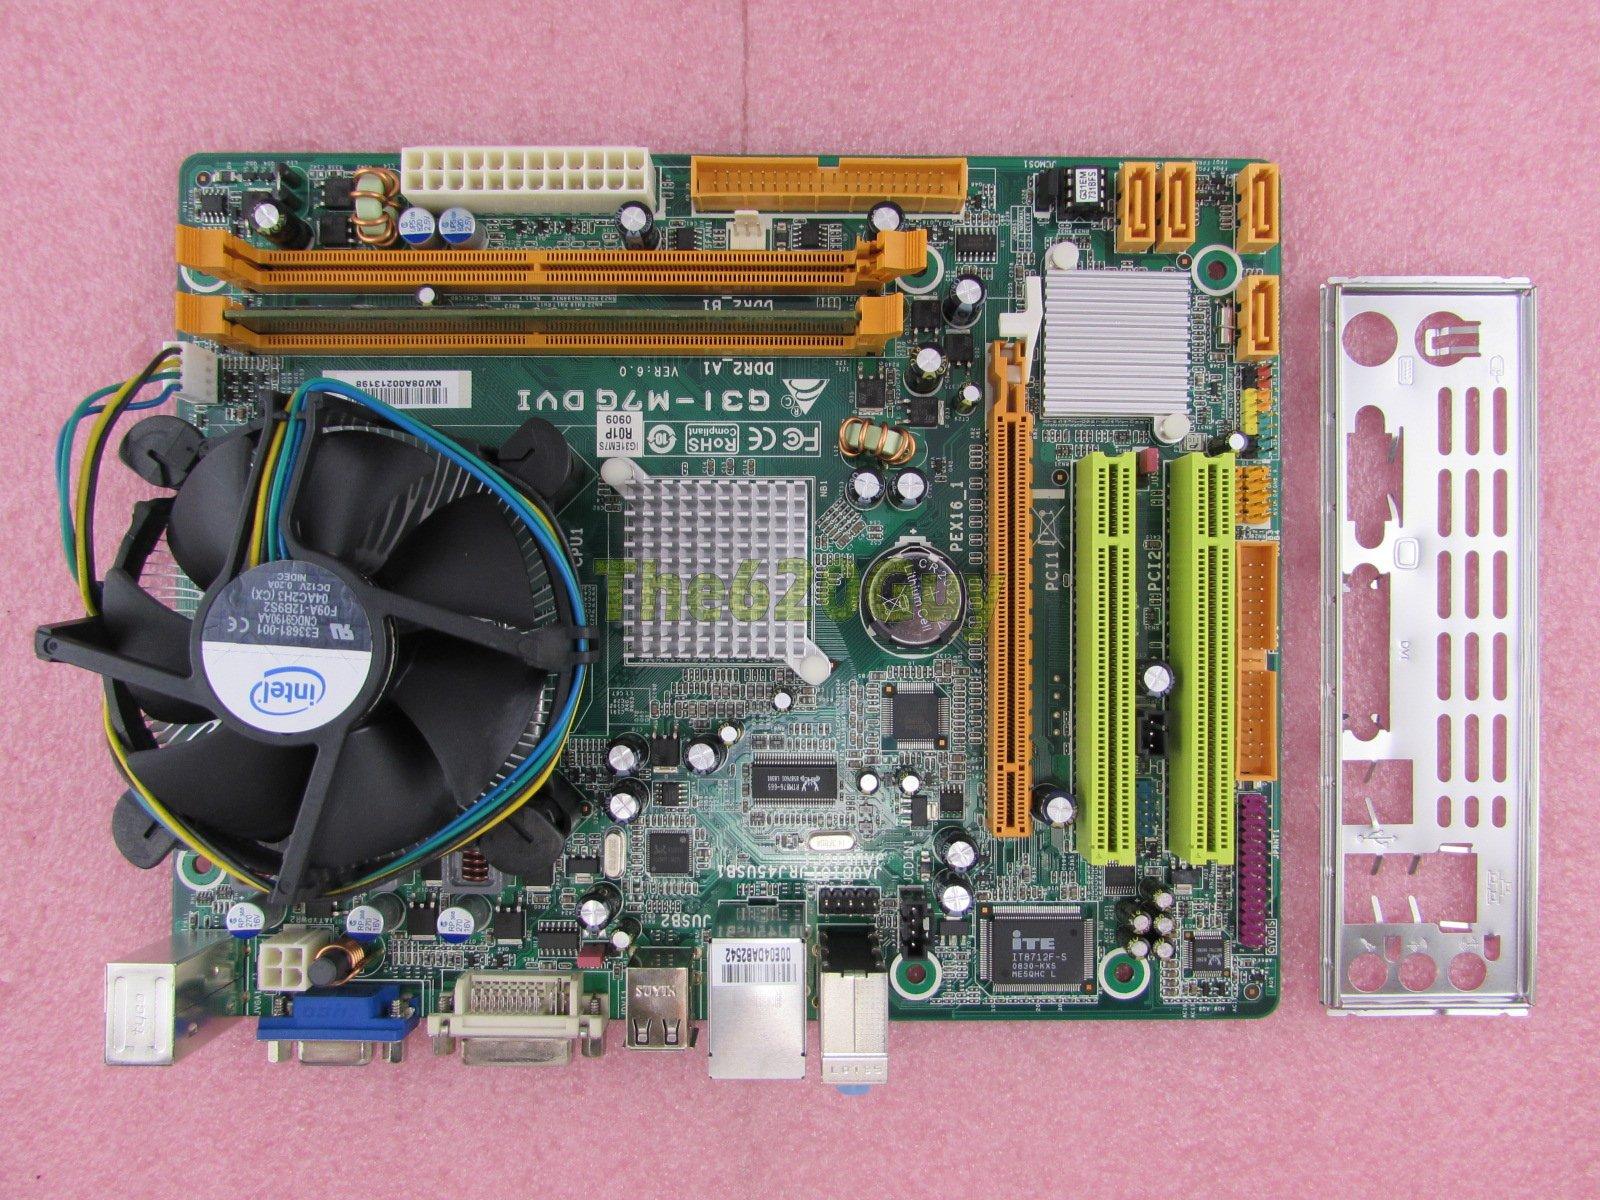 BIOSTAR G31-M7G DVI TREIBER WINDOWS 7